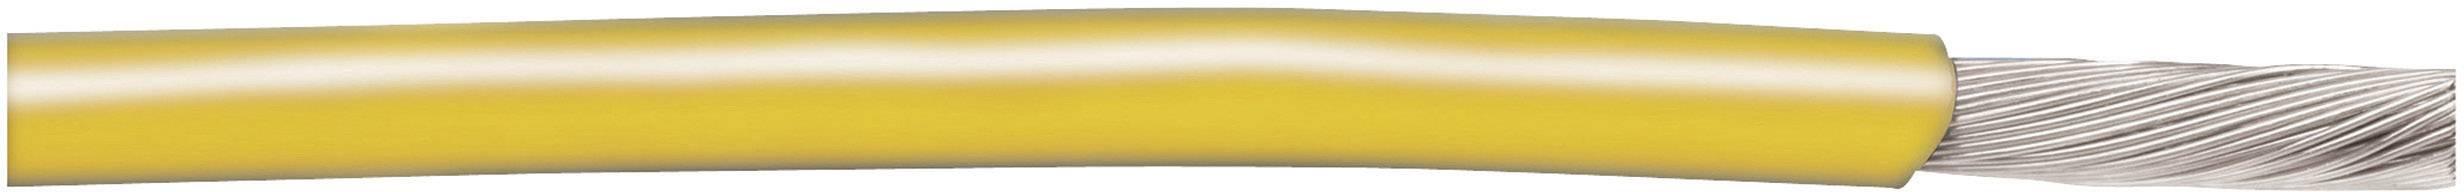 Opletenie / lanko AlphaWire 3051-005-YEL 1 x 0.32 mm², vonkajší Ø 1.57 mm, 30.5 m, žltá